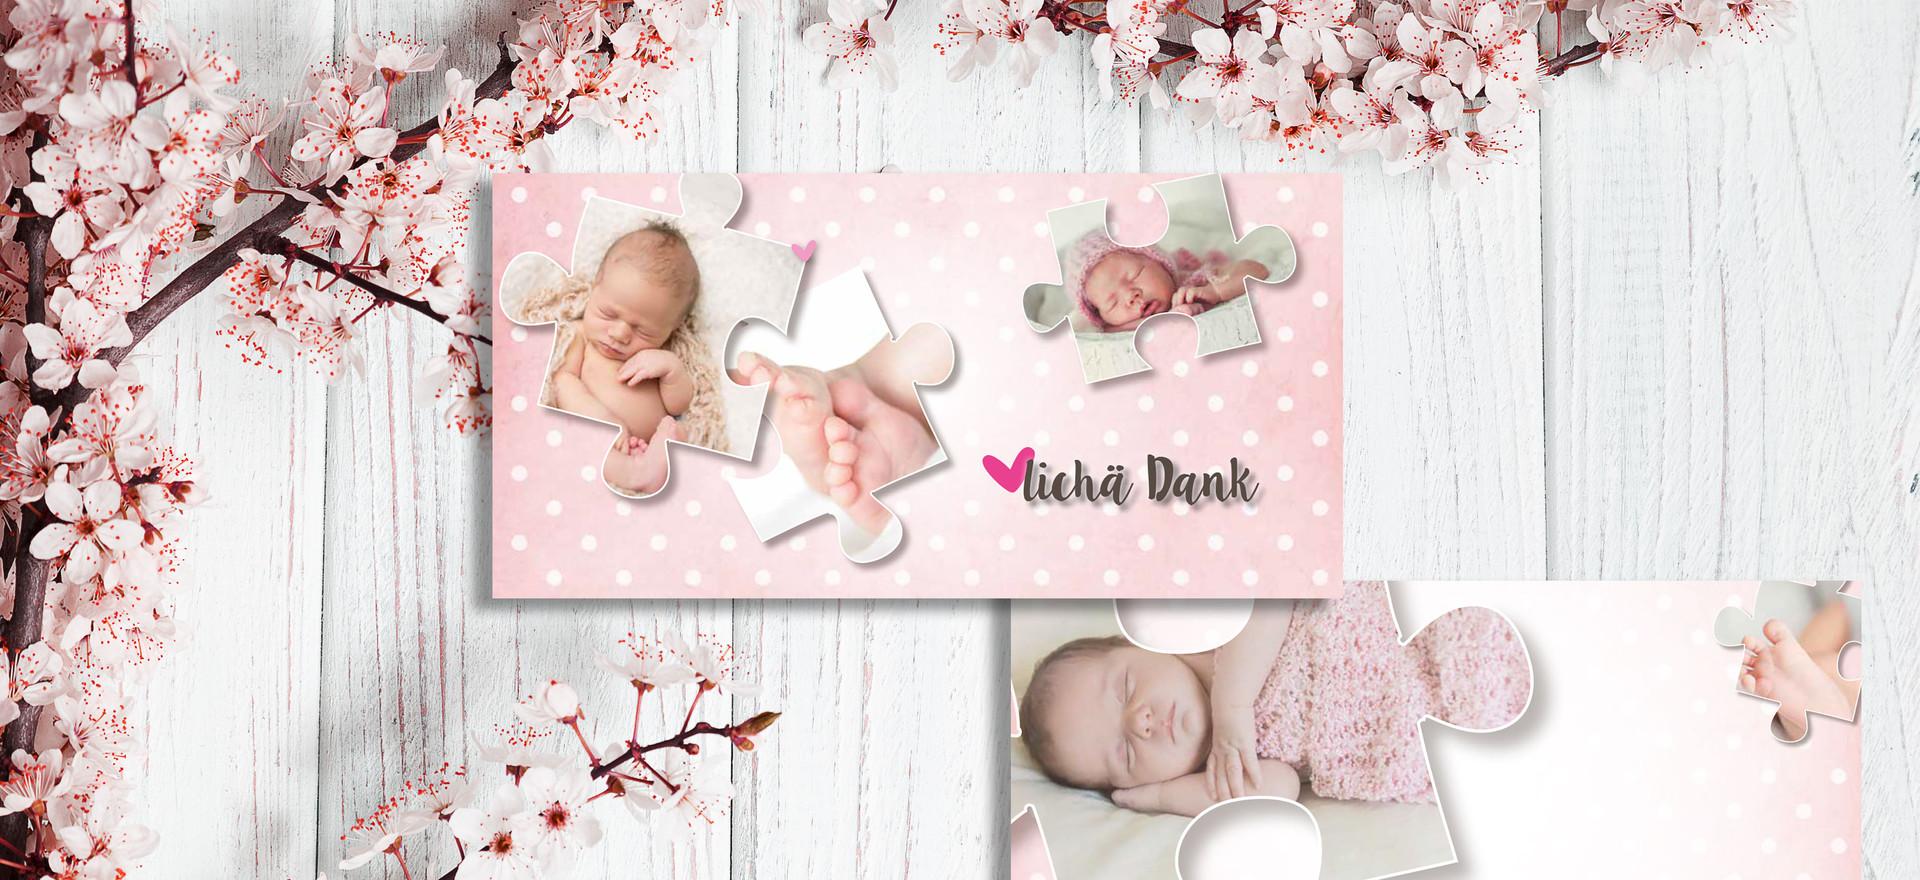 Geburtskarten, Hochzeitskarten, Dankeskarten, Dankeskarte Lola | Schweiz | online bestellen